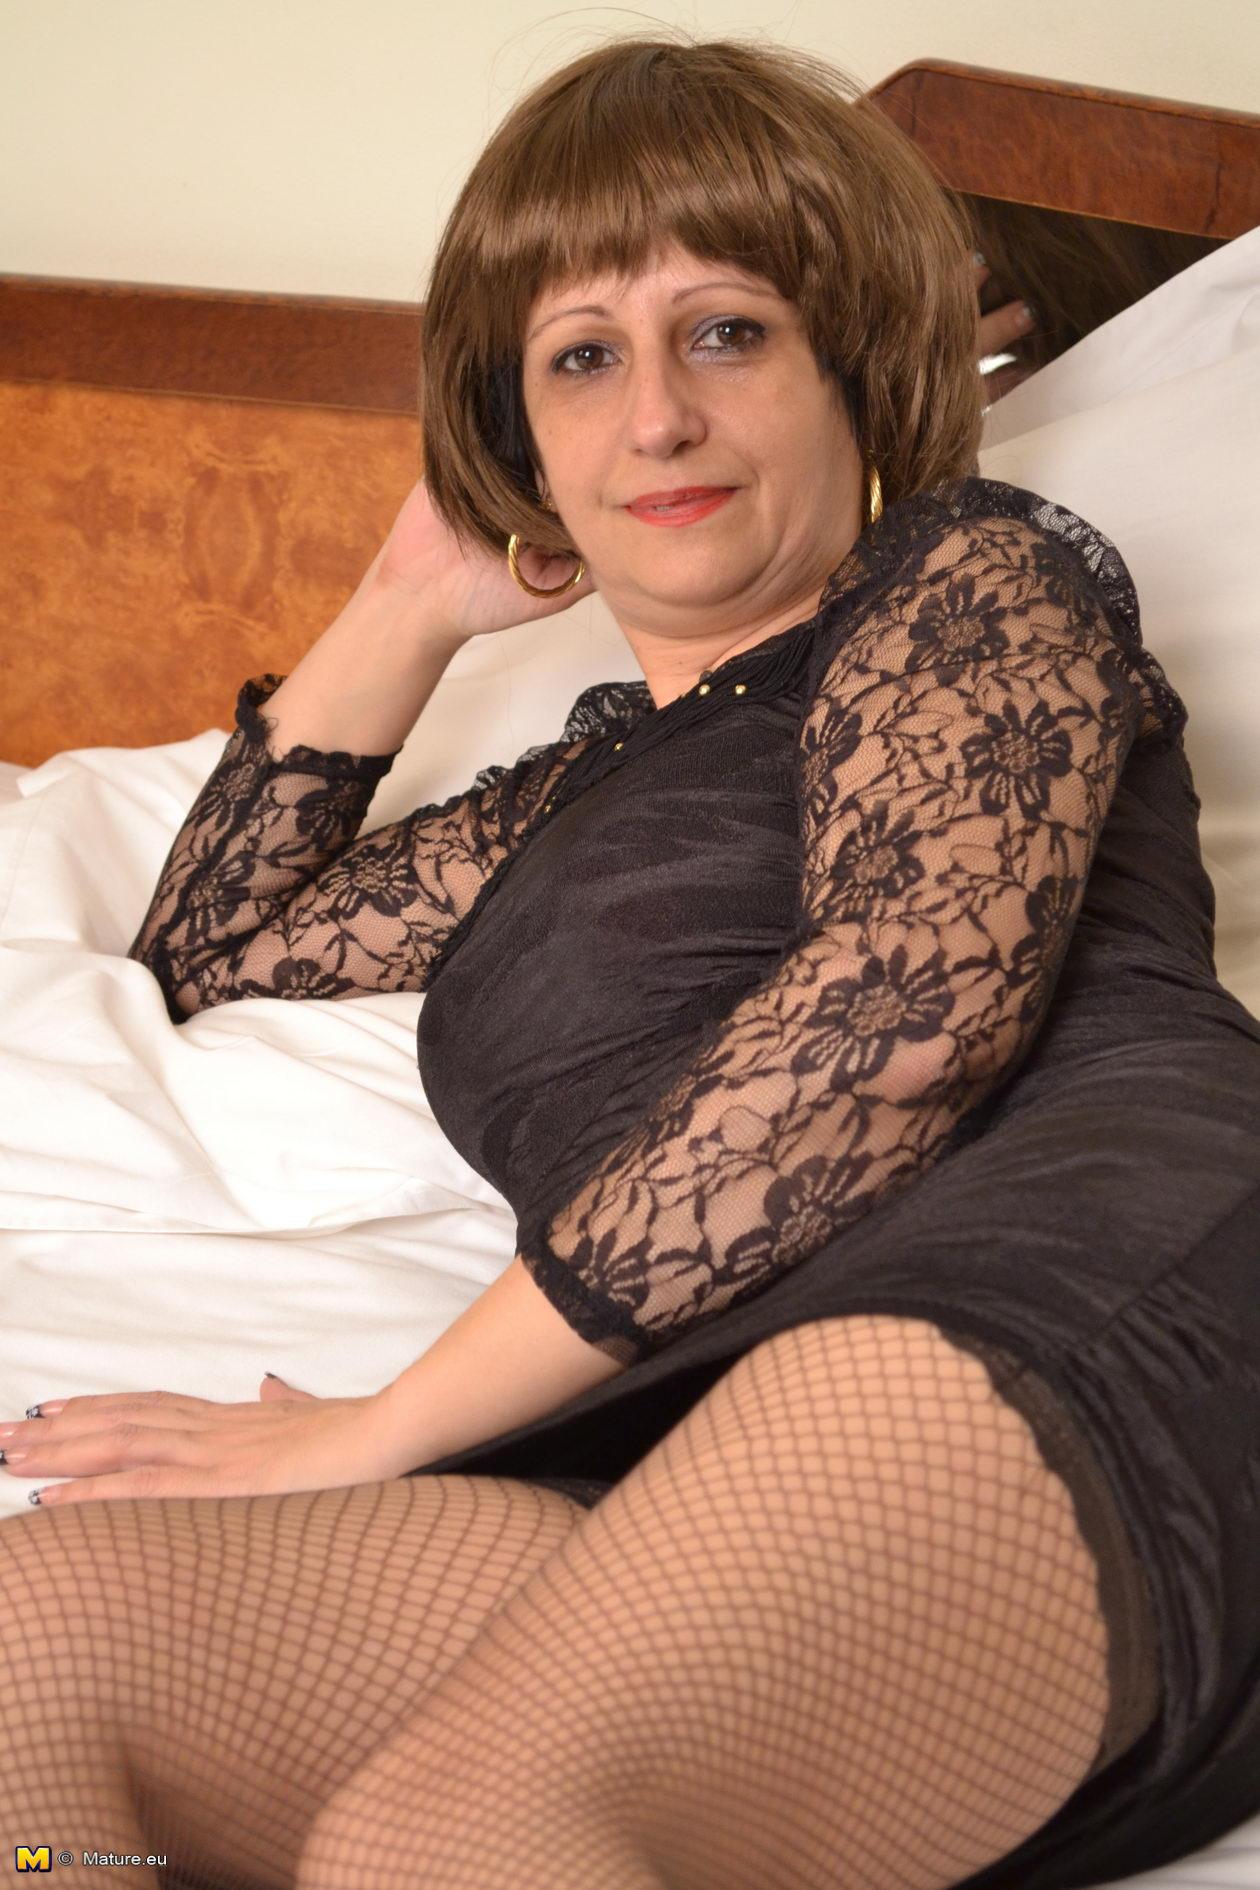 Fitting room voyeur blog